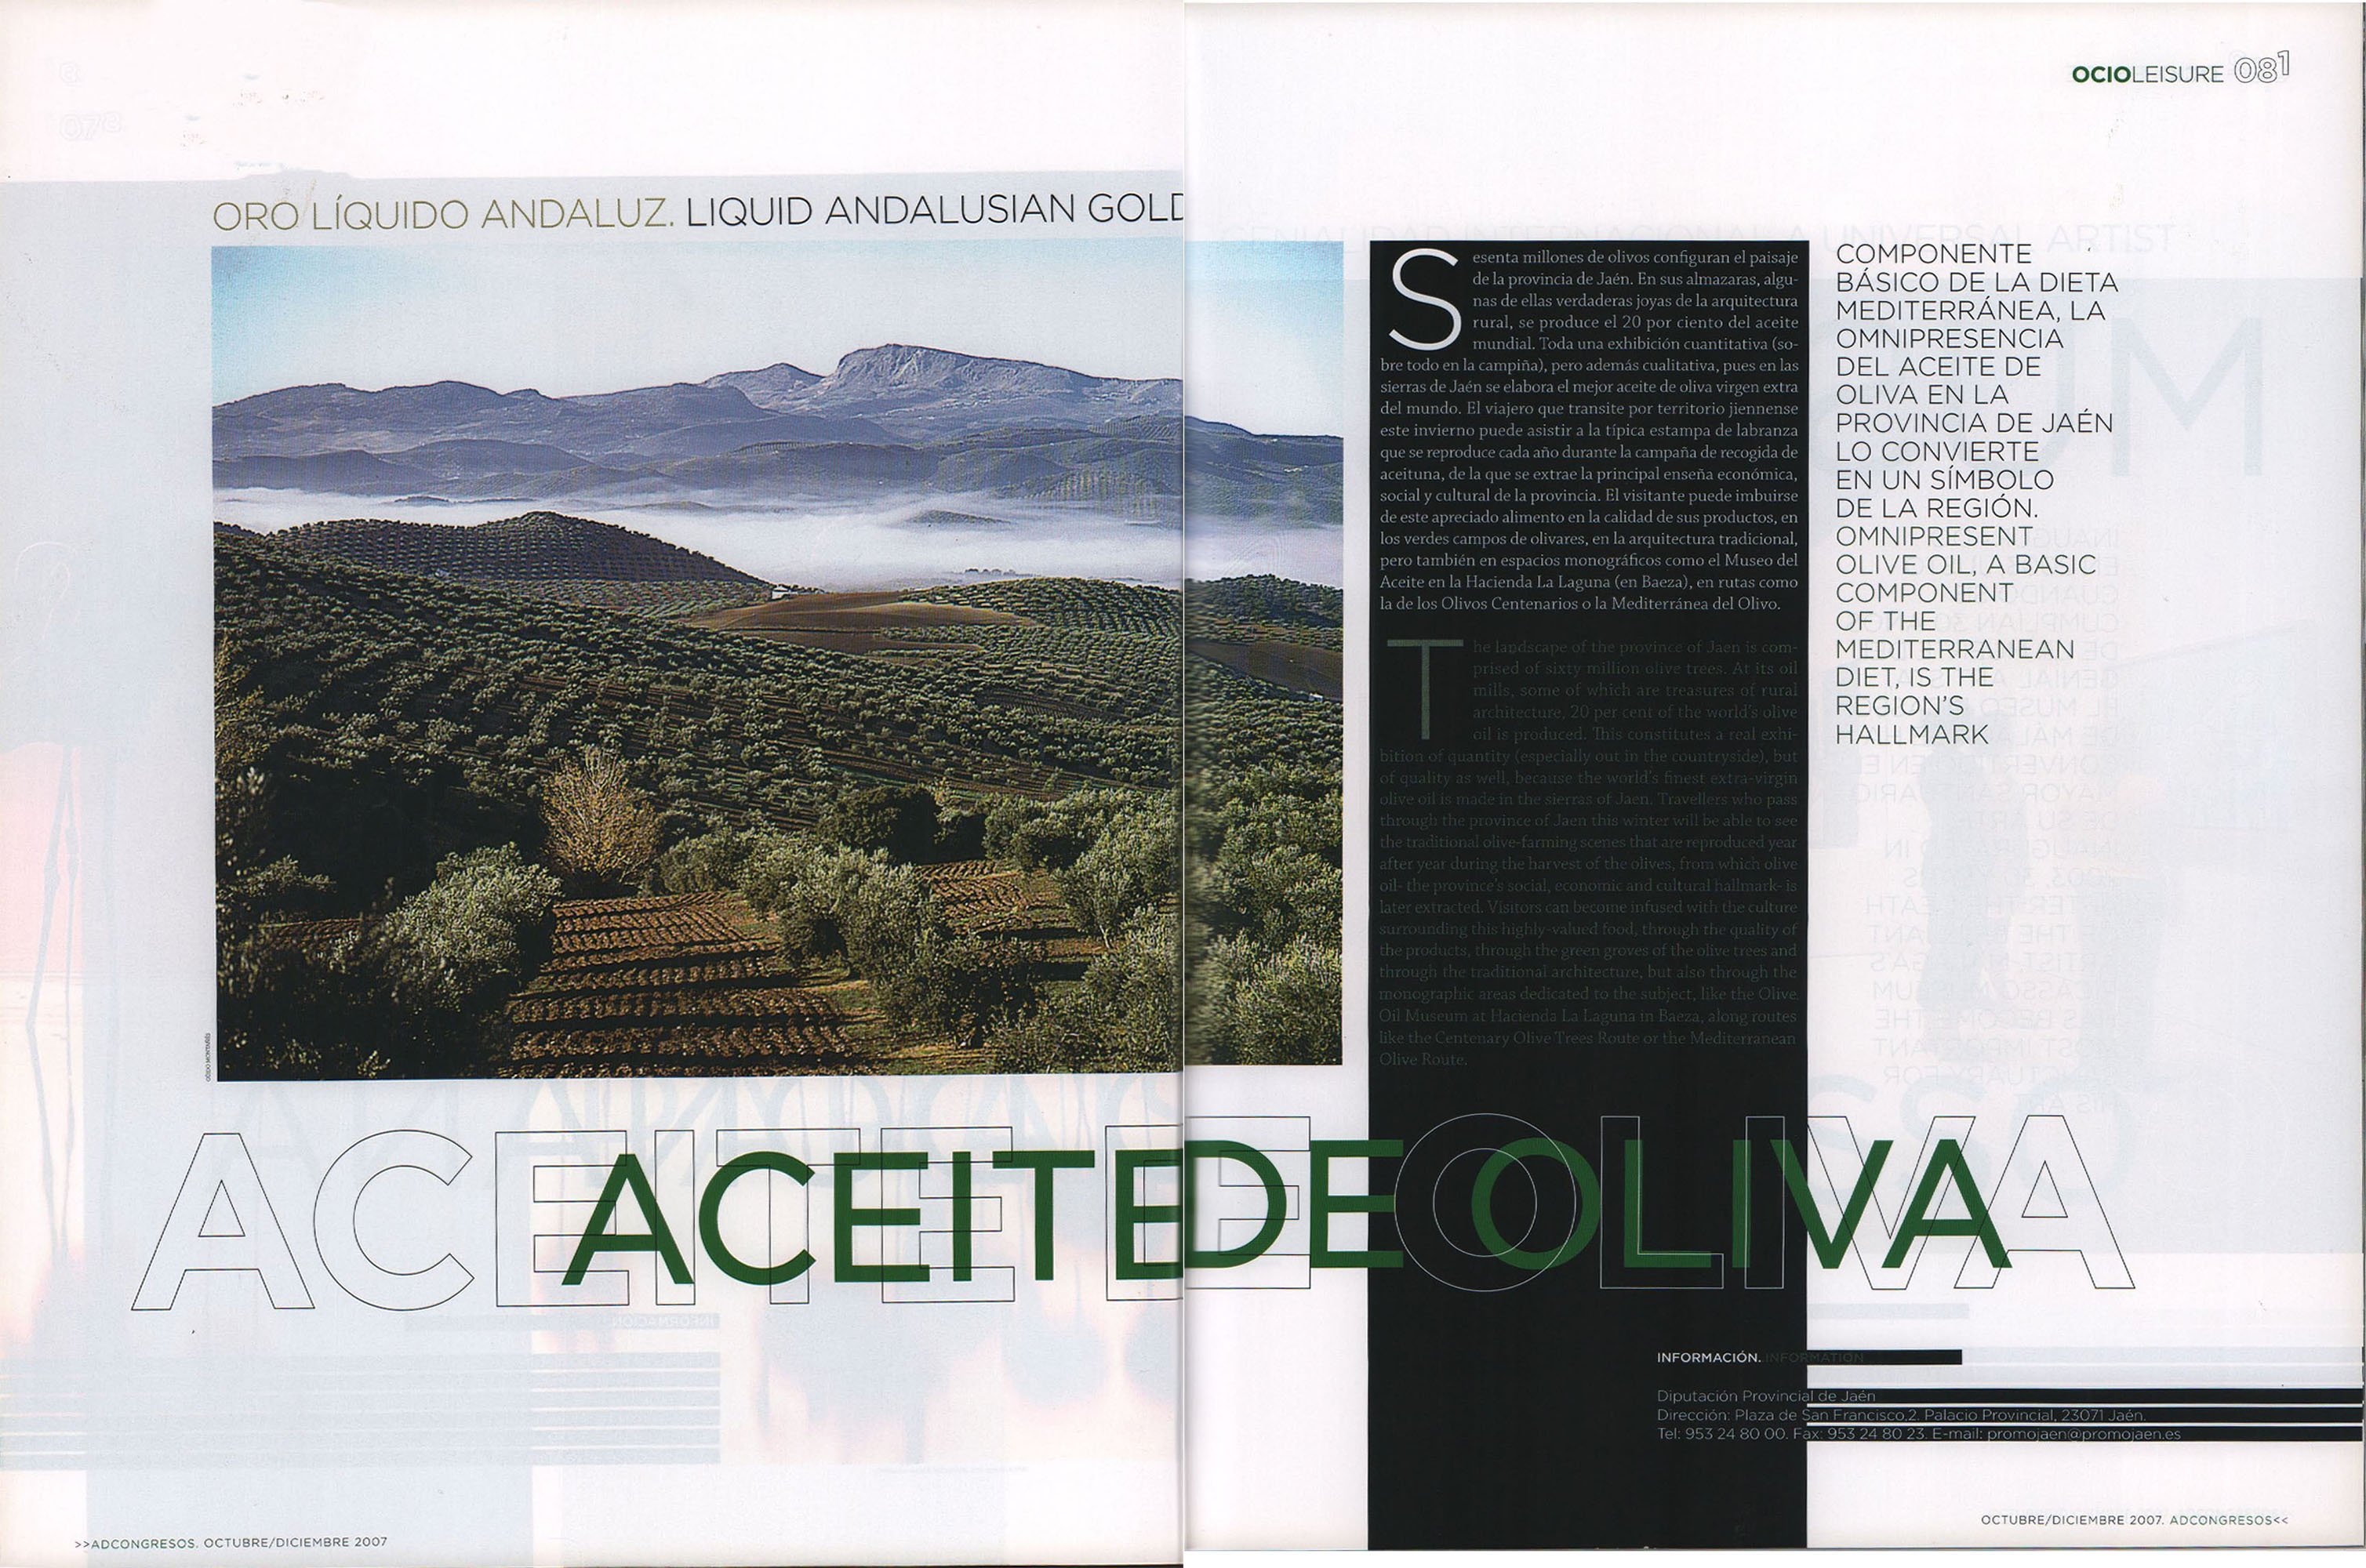 Aceite de oliva | AD Congresos | oct 2007